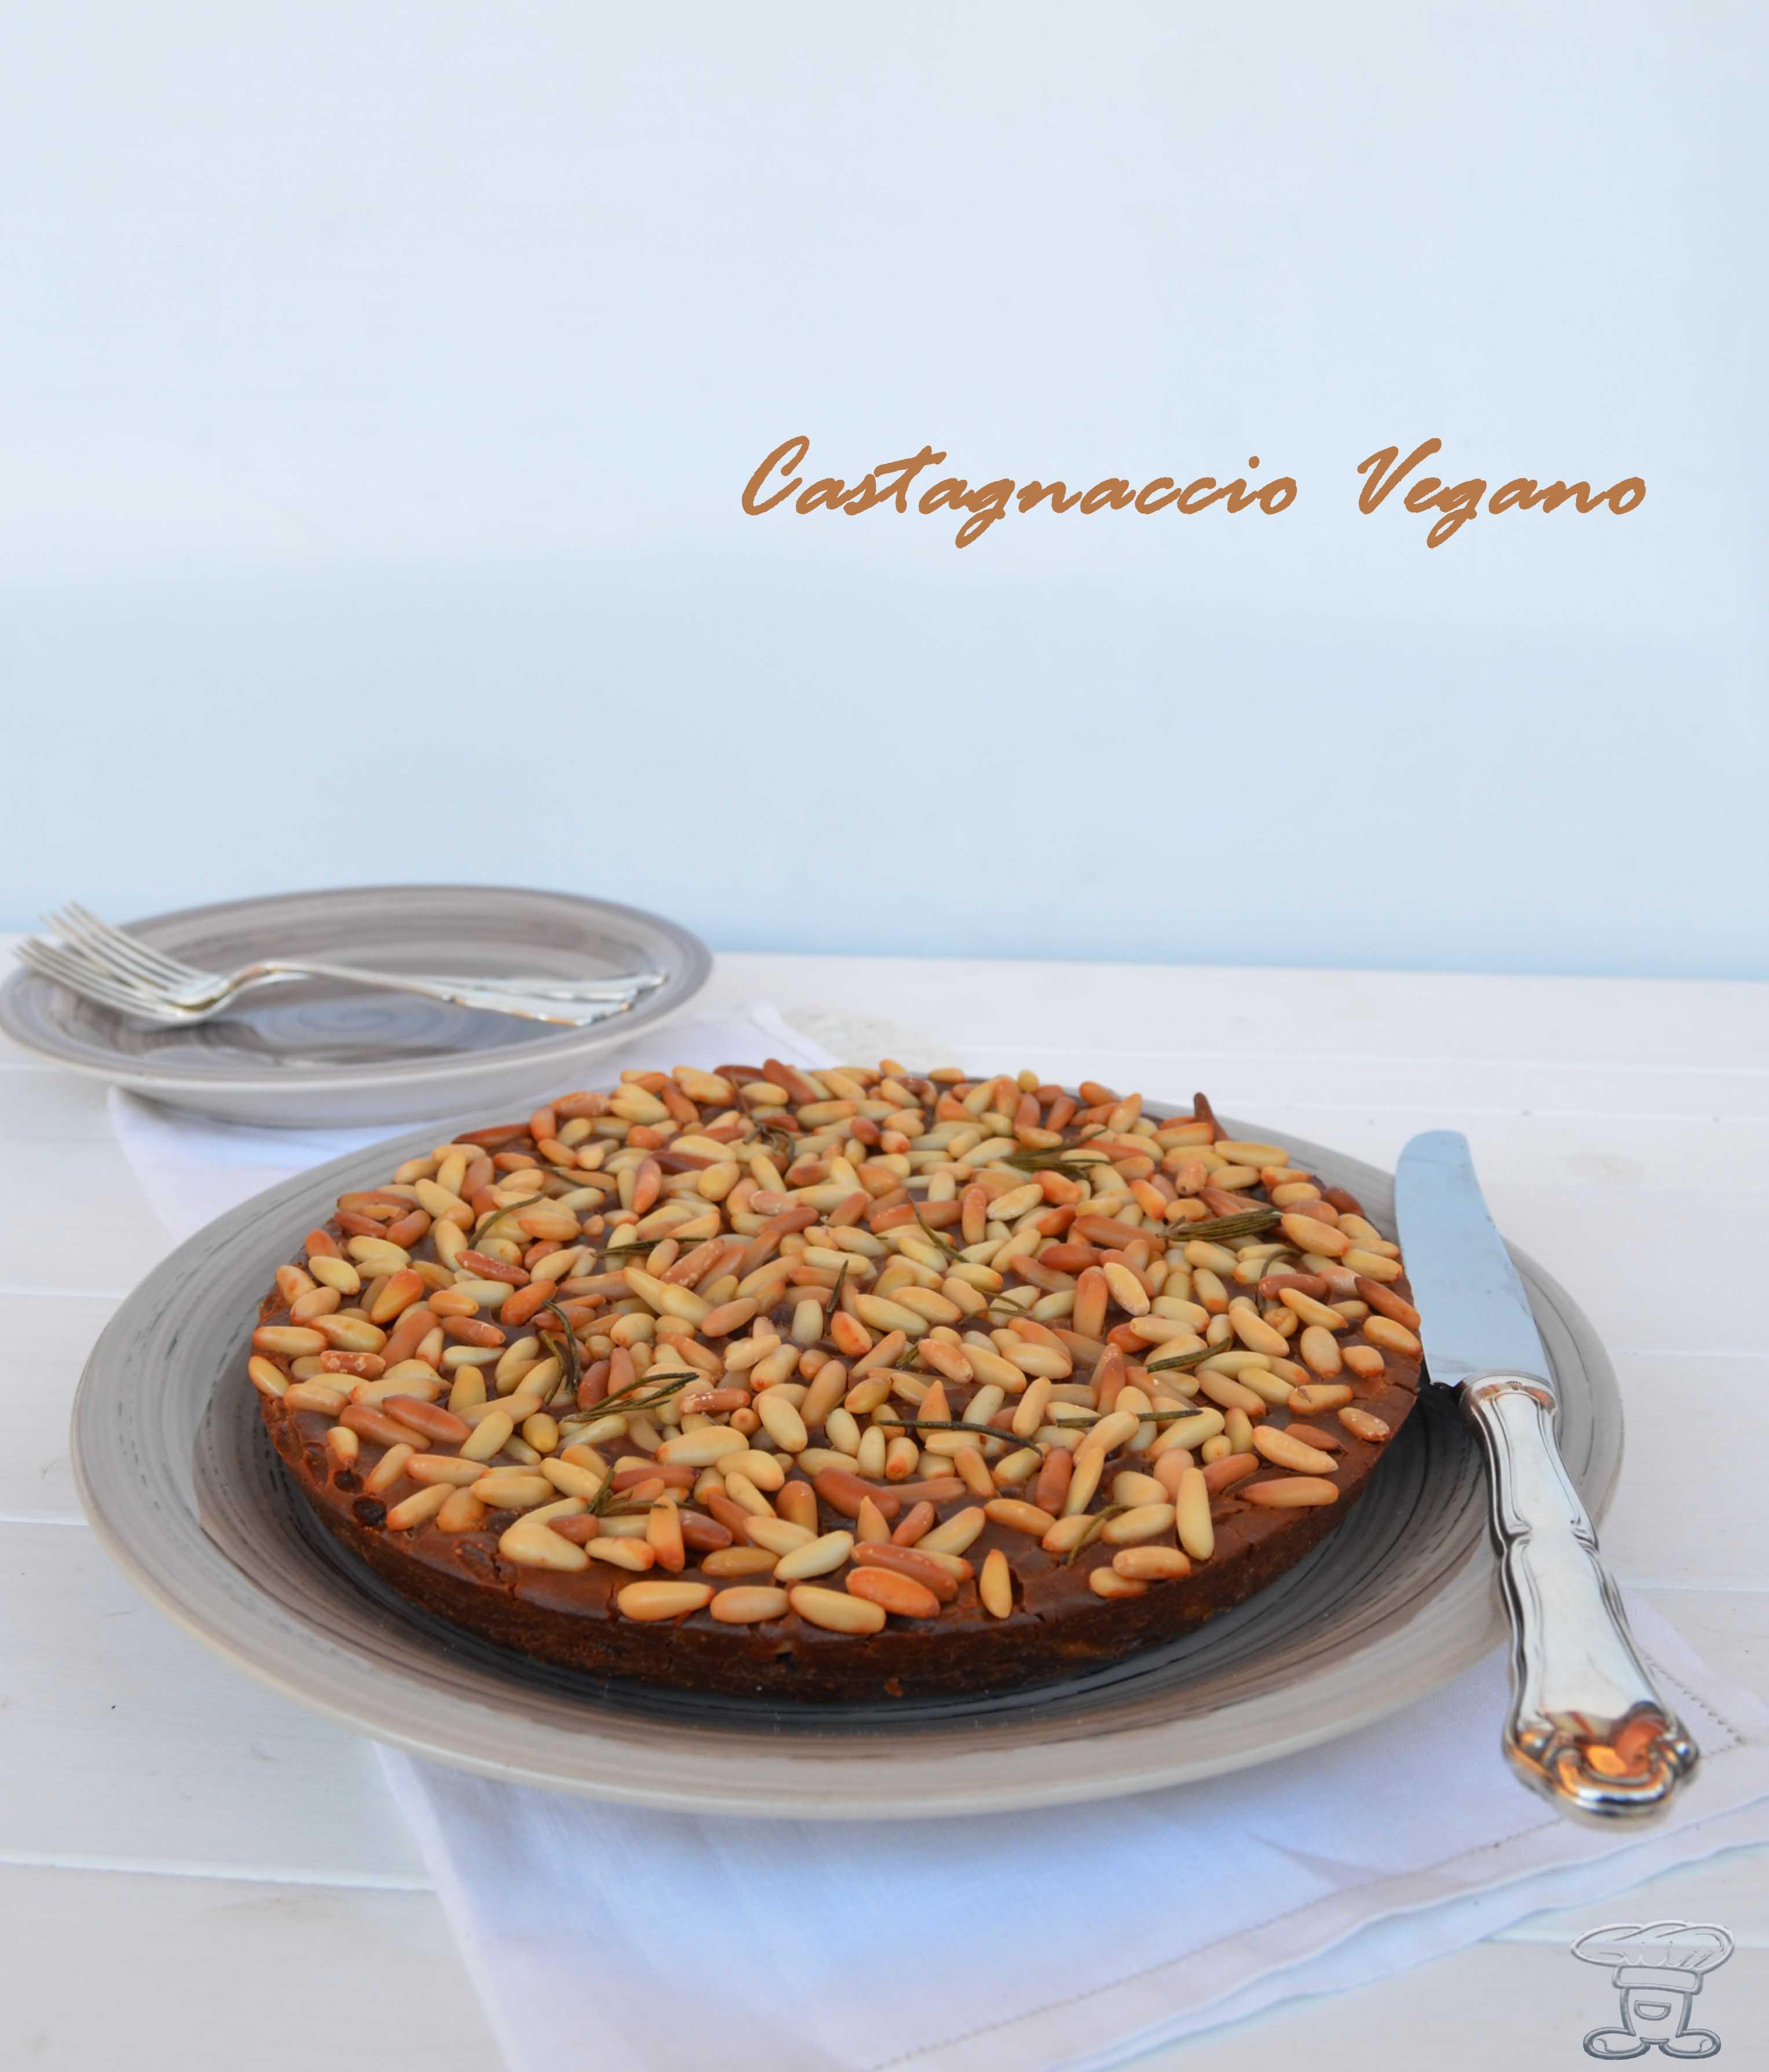 dsc_0758 Castagnaccio Vegano (...senza glutine!!)